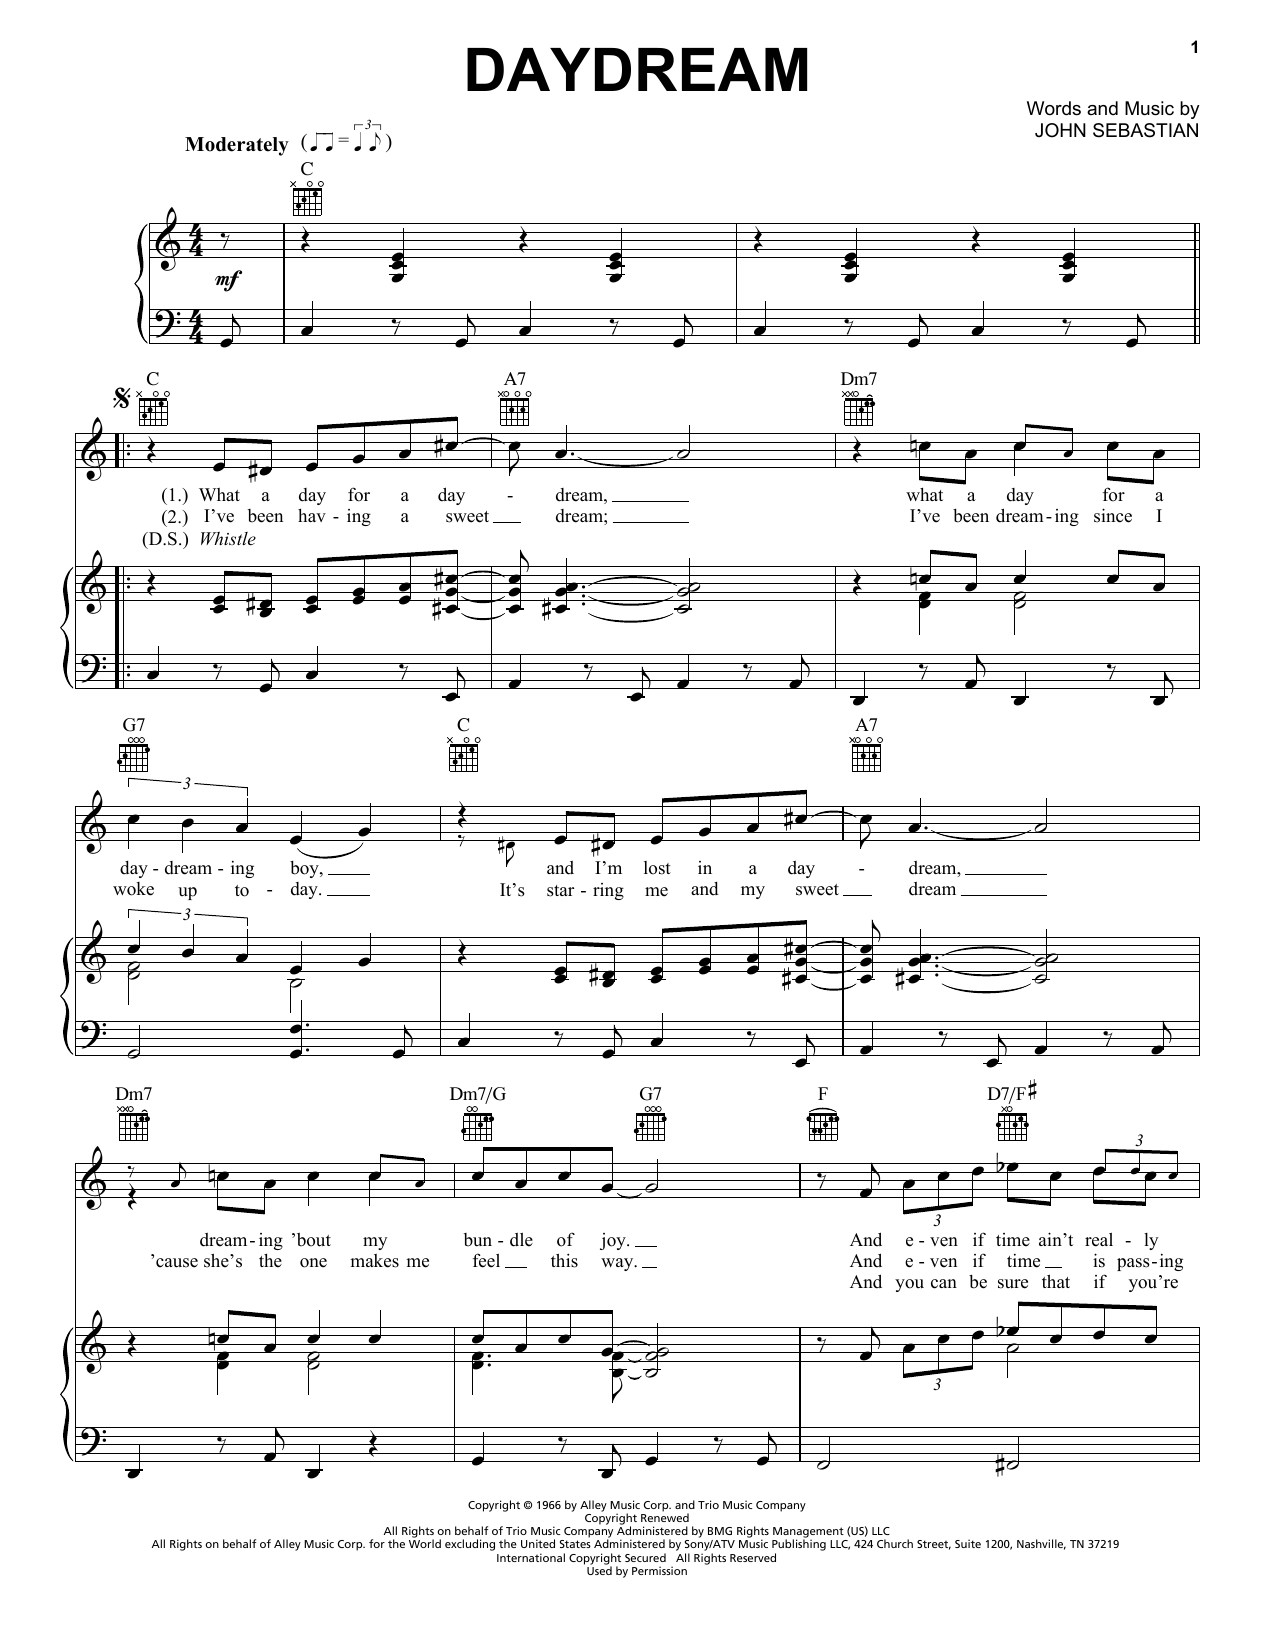 Daydream sheet music